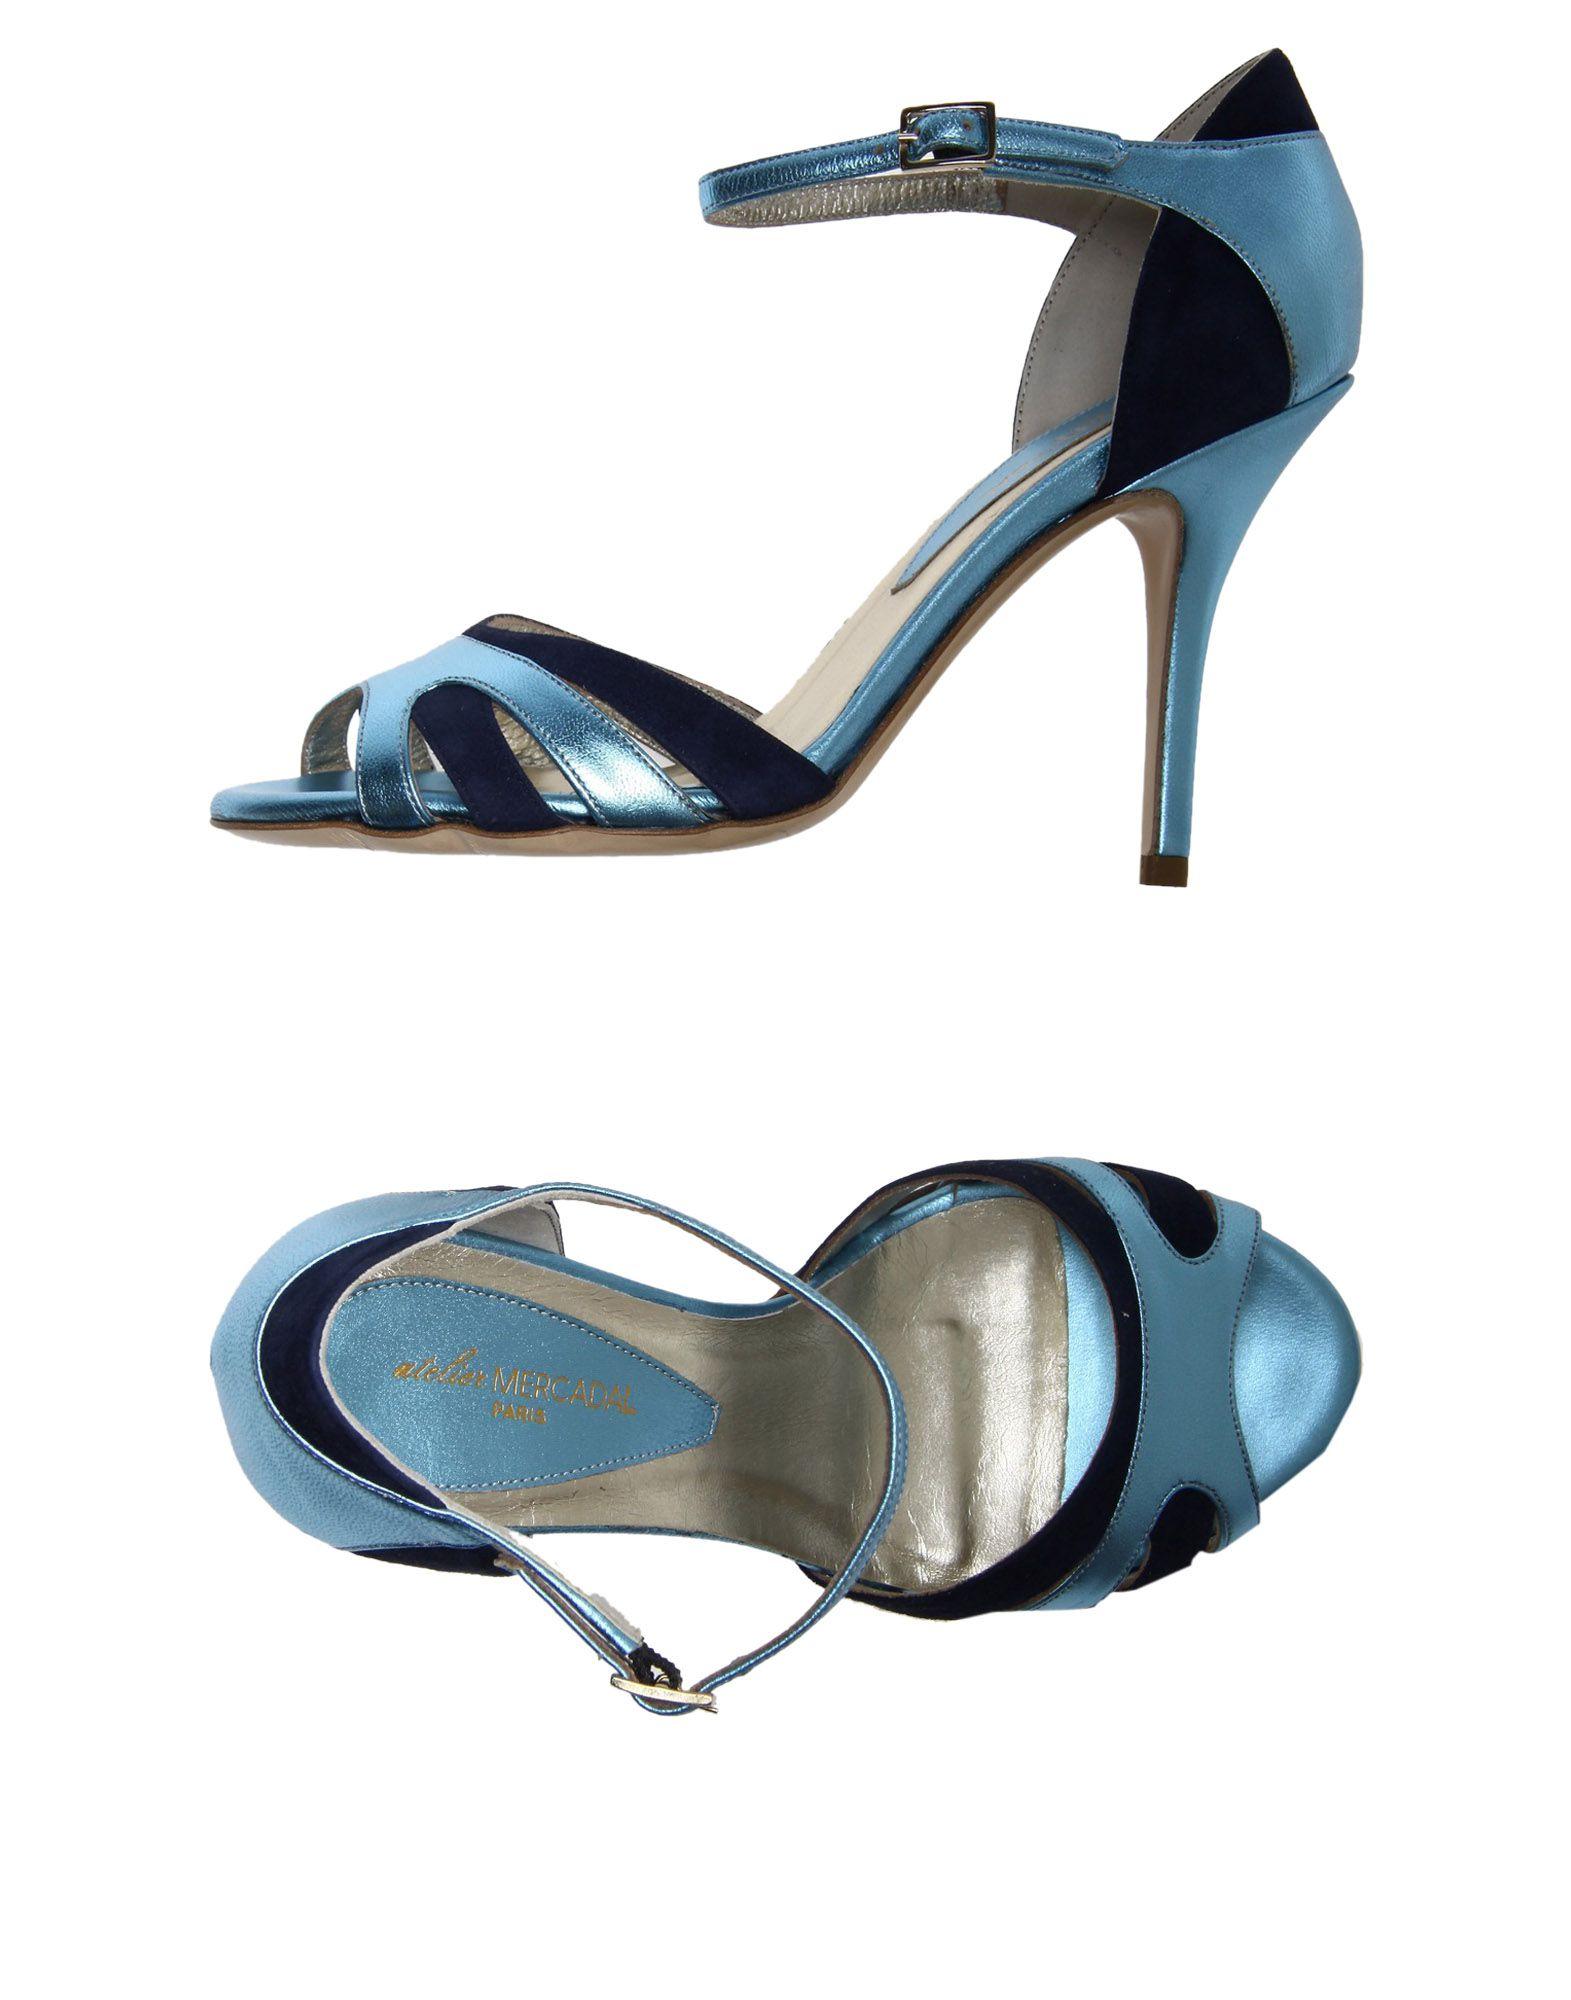 Atelier Mercadal Sandals - Women Women Women Atelier Mercadal Sandals online on  Canada - 44891501LR 45d685